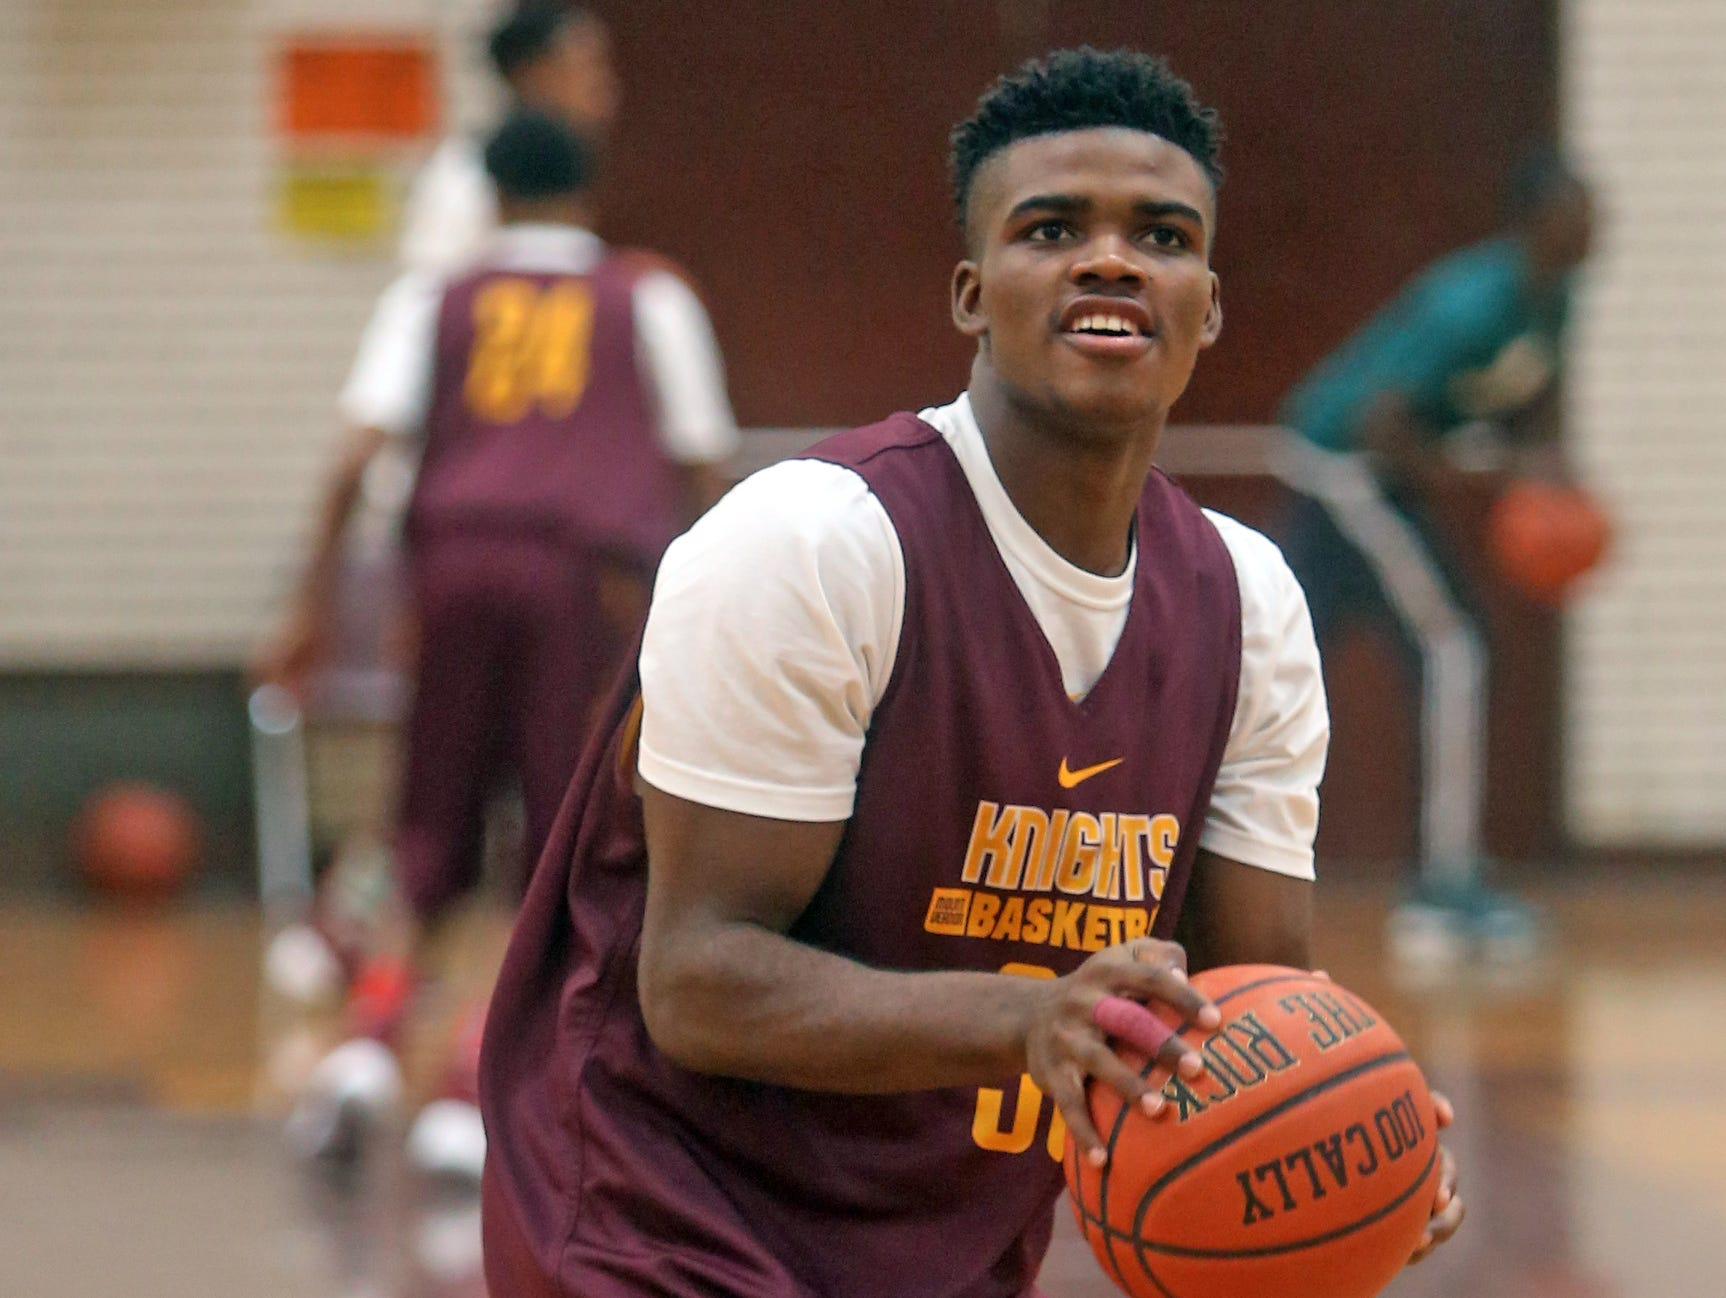 Mount Vernon High School basketball player Jamie Wiltshire shoots during practice Nov. 25, 2015.